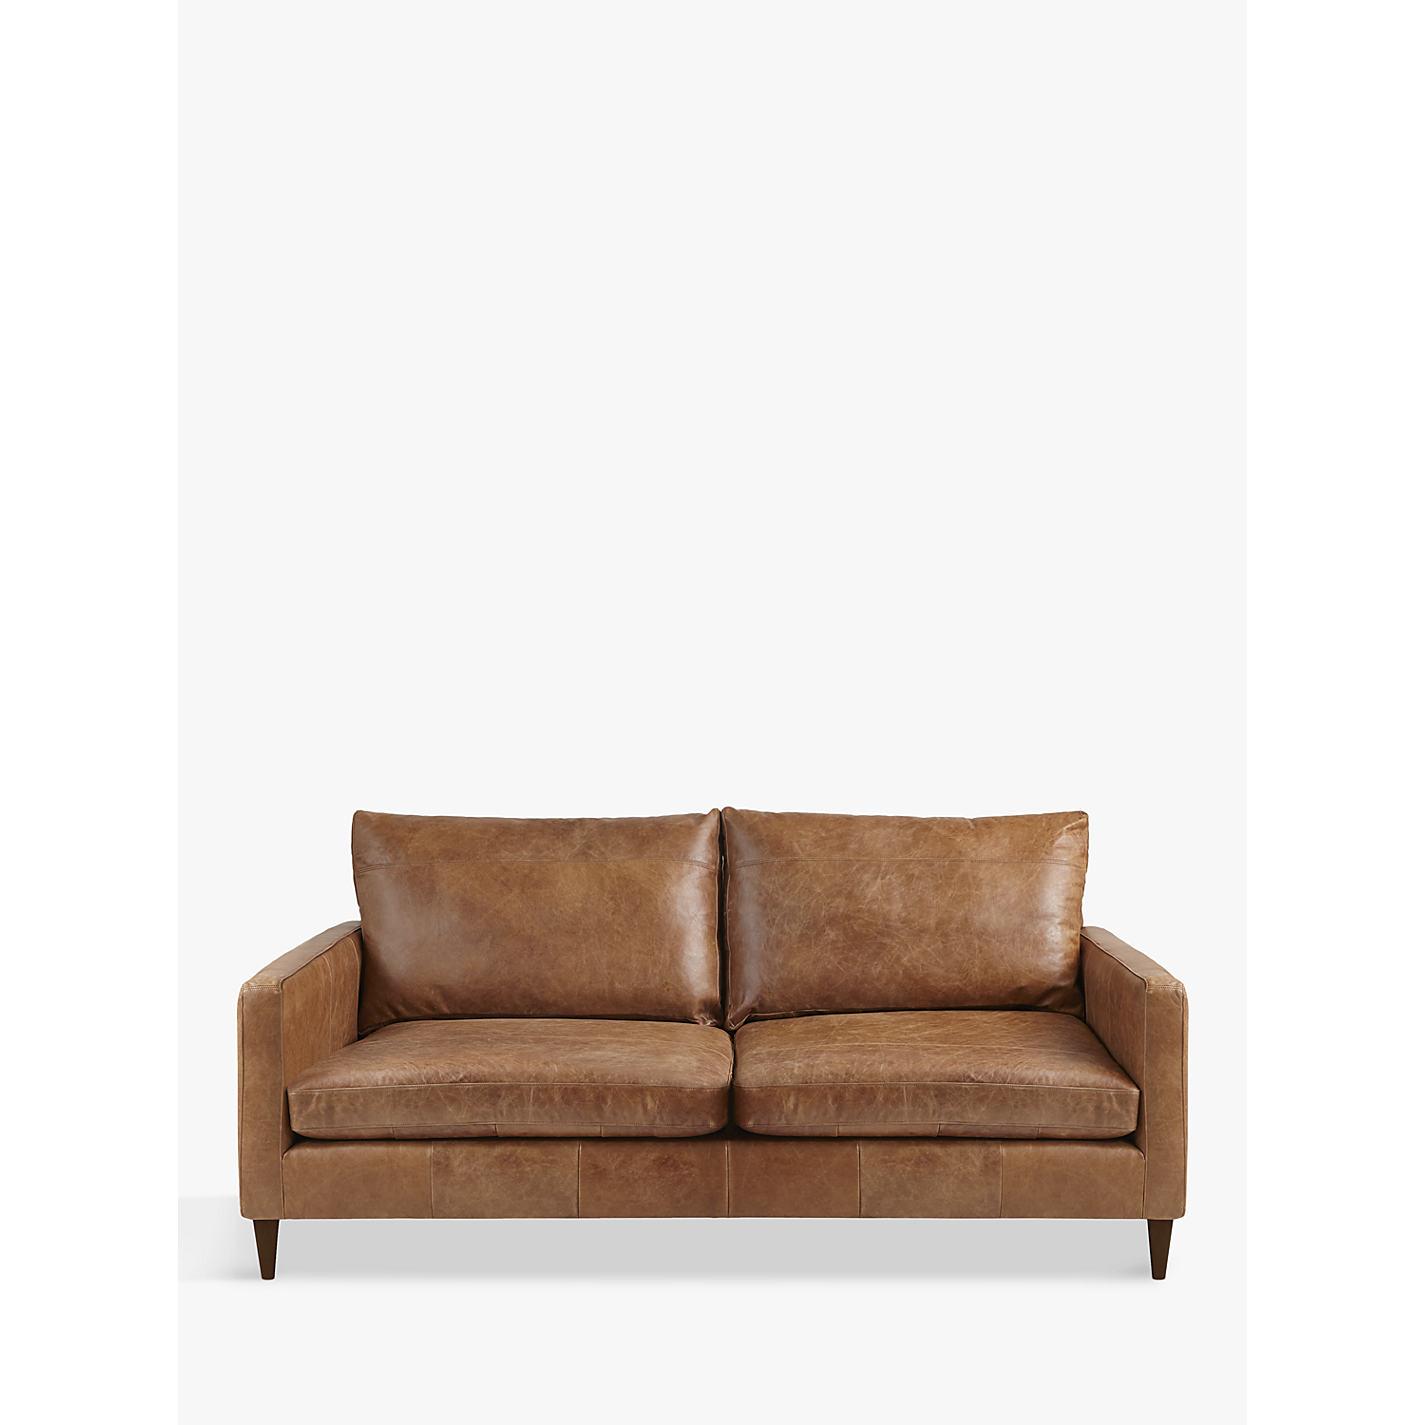 aniline leather sofa chelsea aniline leather 2 seater sofa. Black Bedroom Furniture Sets. Home Design Ideas